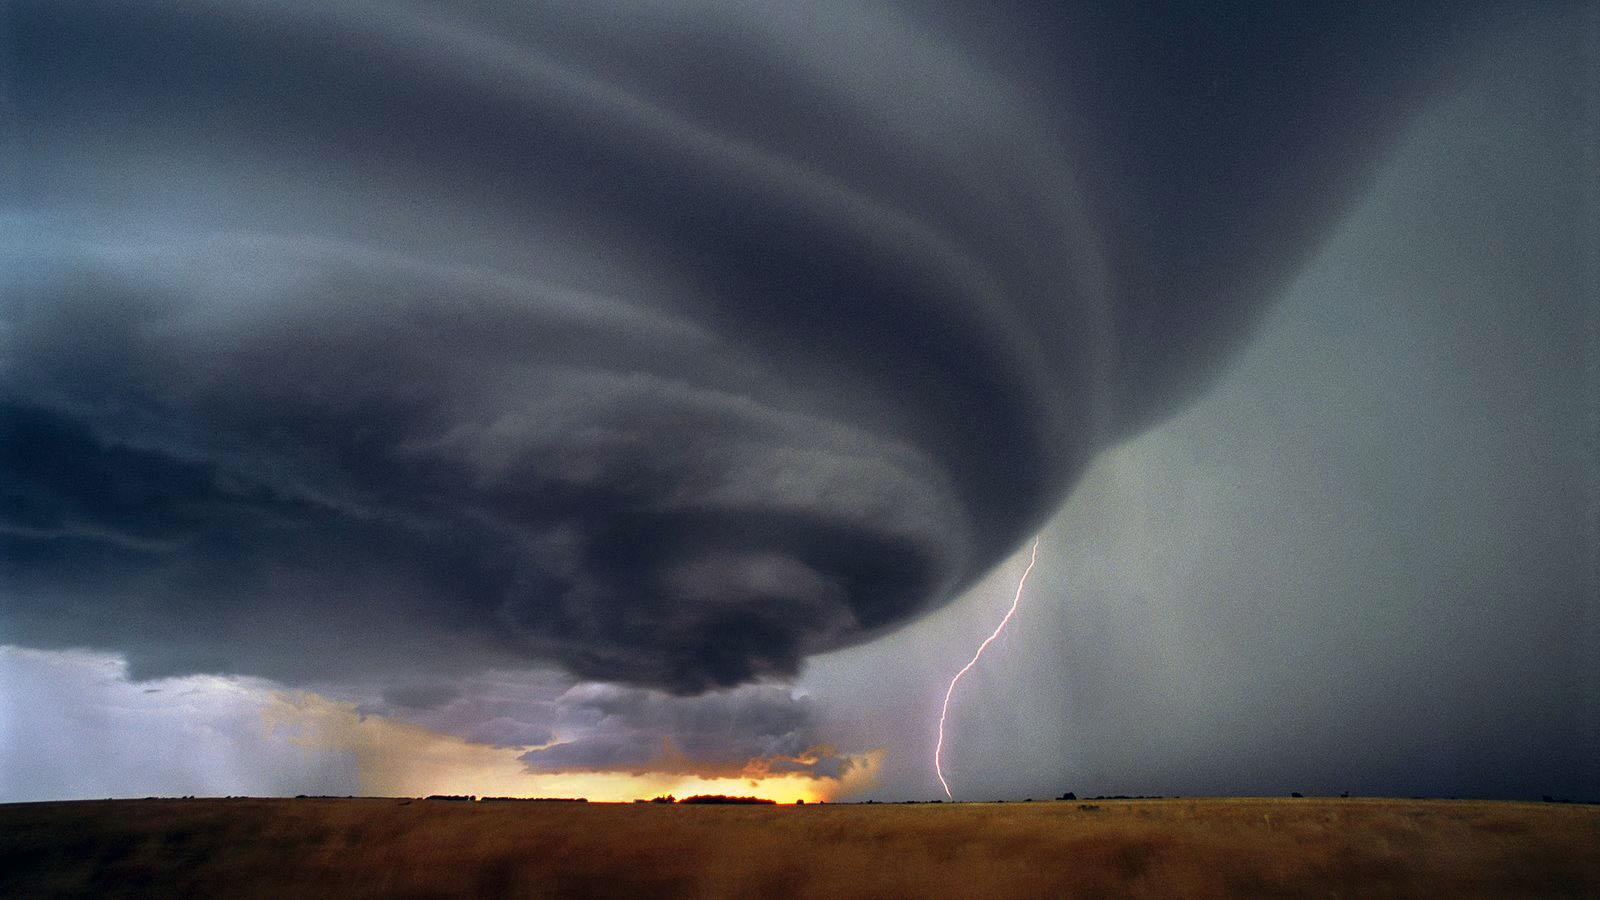 amazing thunderstorm wallpaper raging hurricane Desktop Background 1600x900